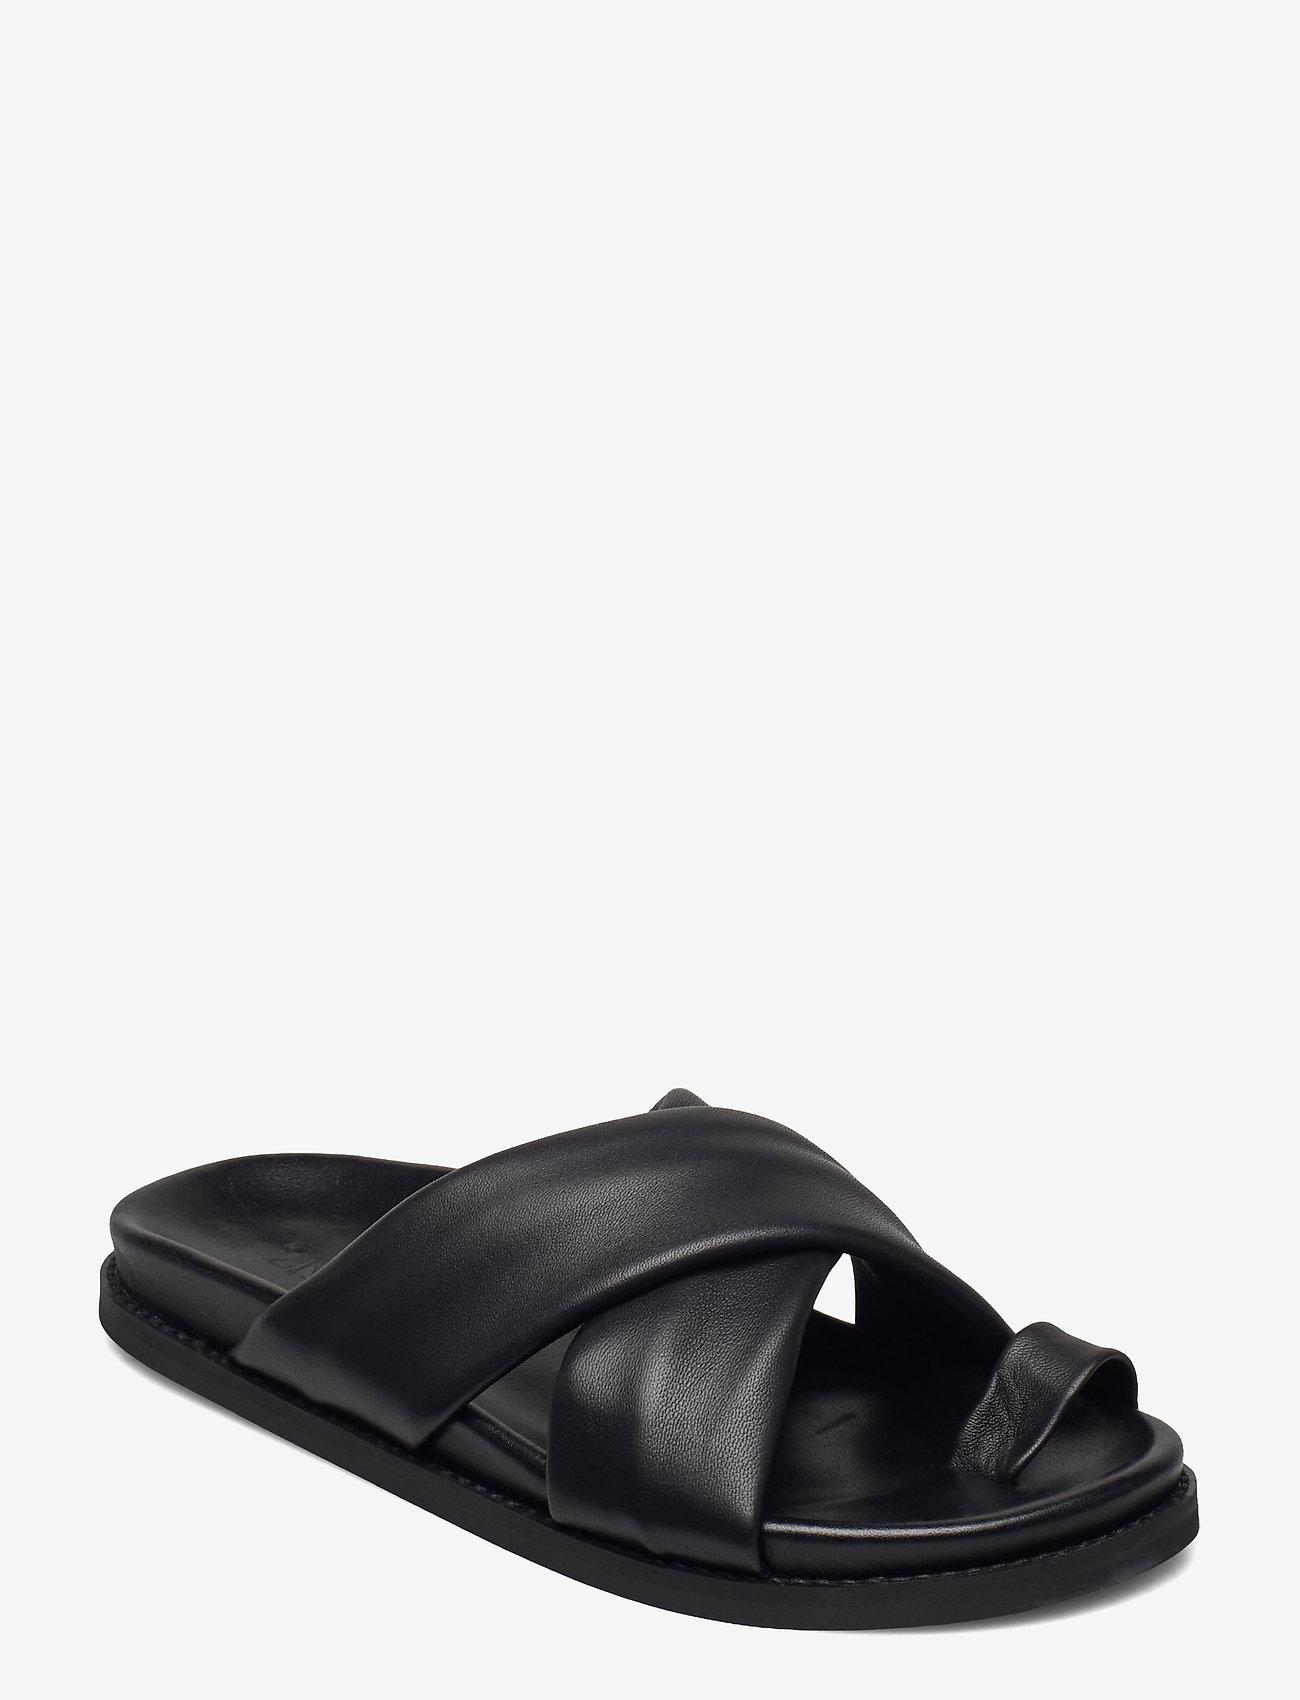 2NDDAY - 2ND Henri - flat sandals - black - 0